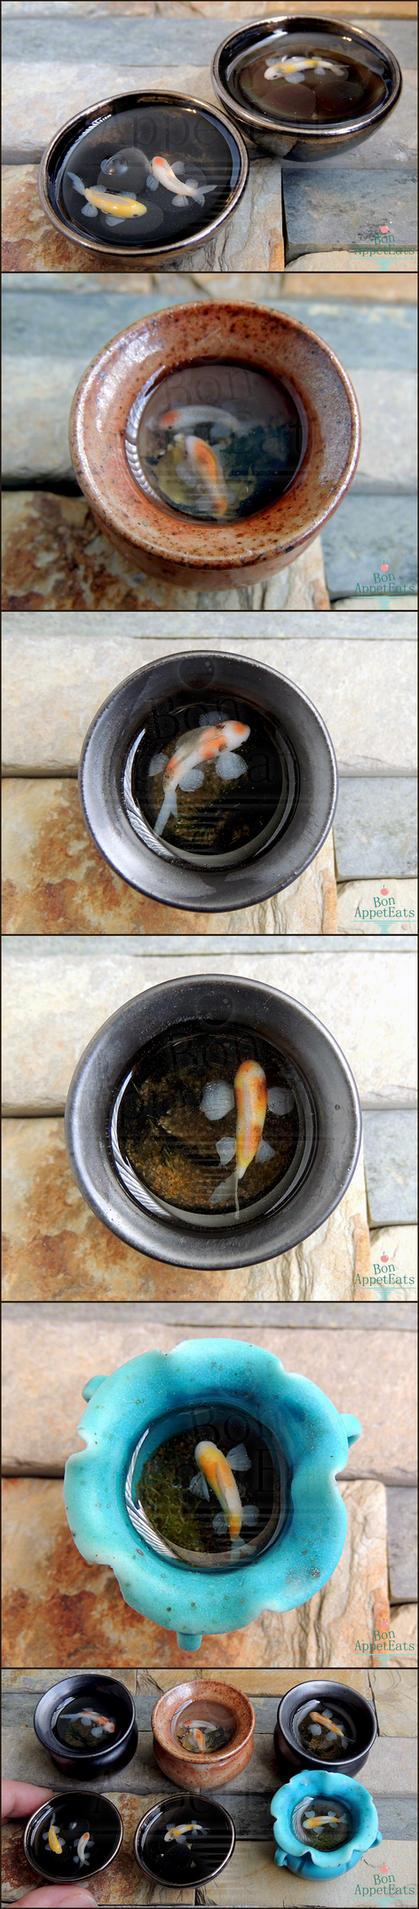 1:12 Koi Pots by Bon-AppetEats